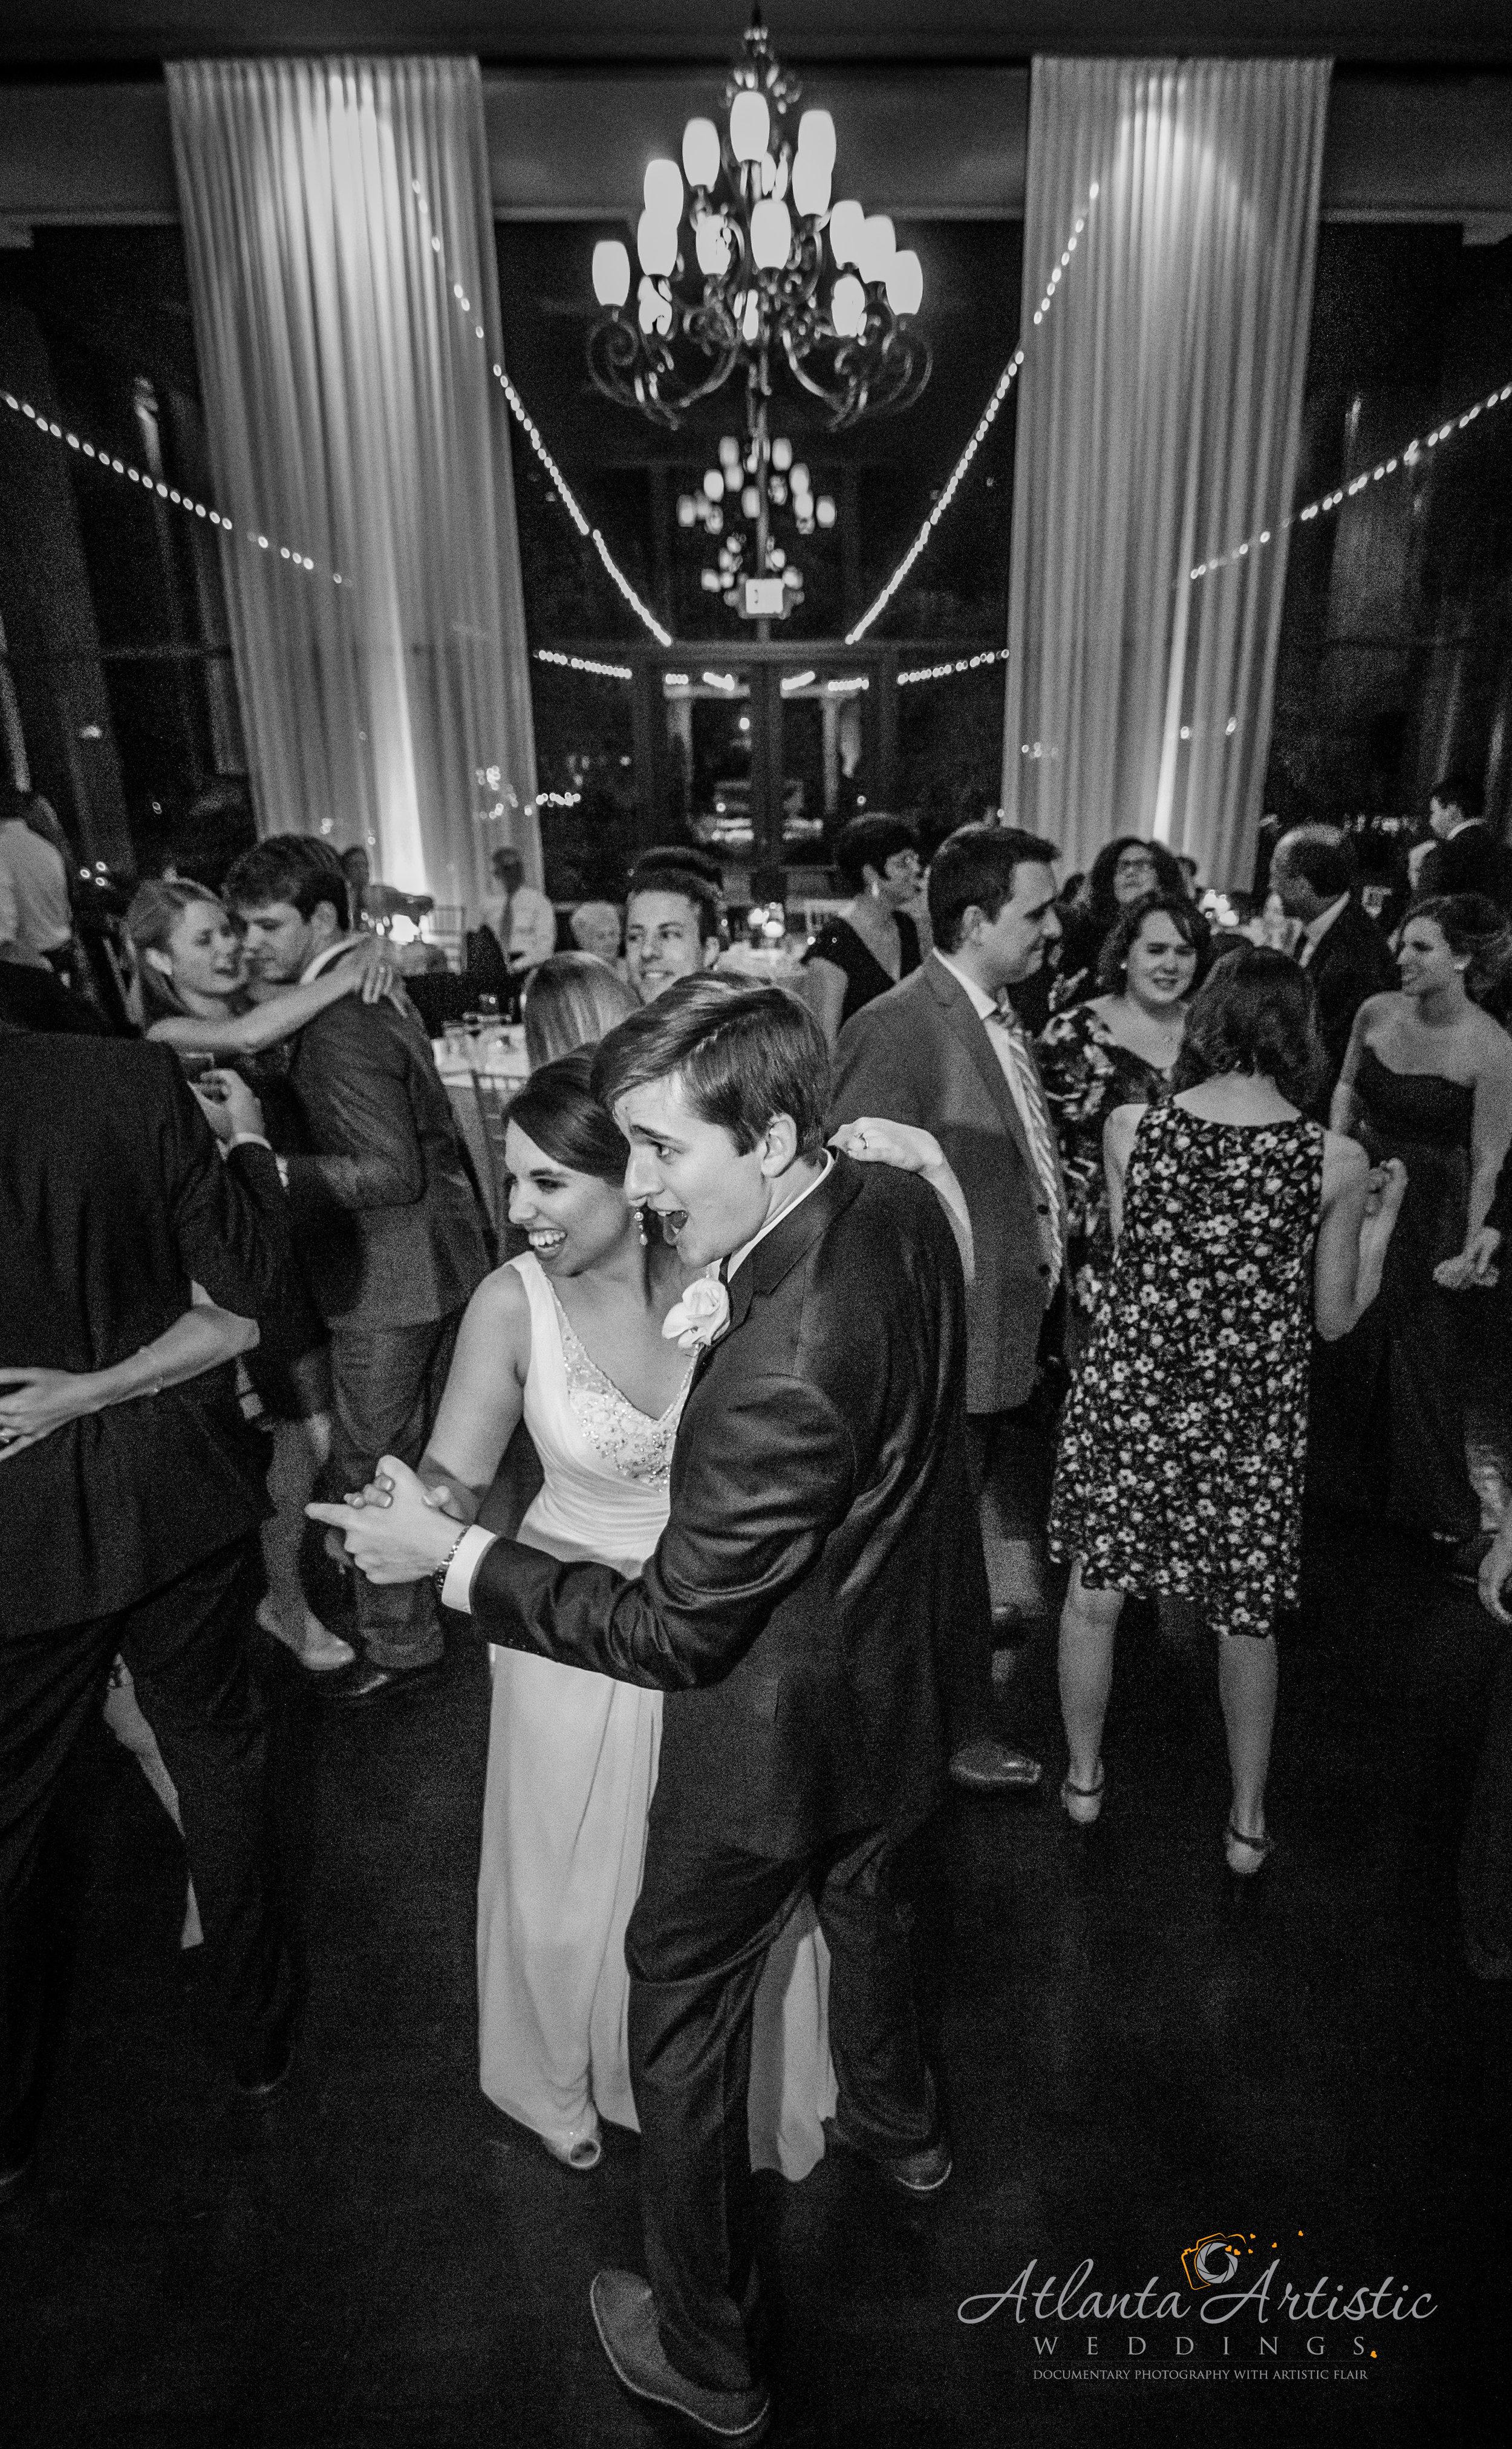 Photo-documentary Wedding Photography by Atlanta Artistic Weddings